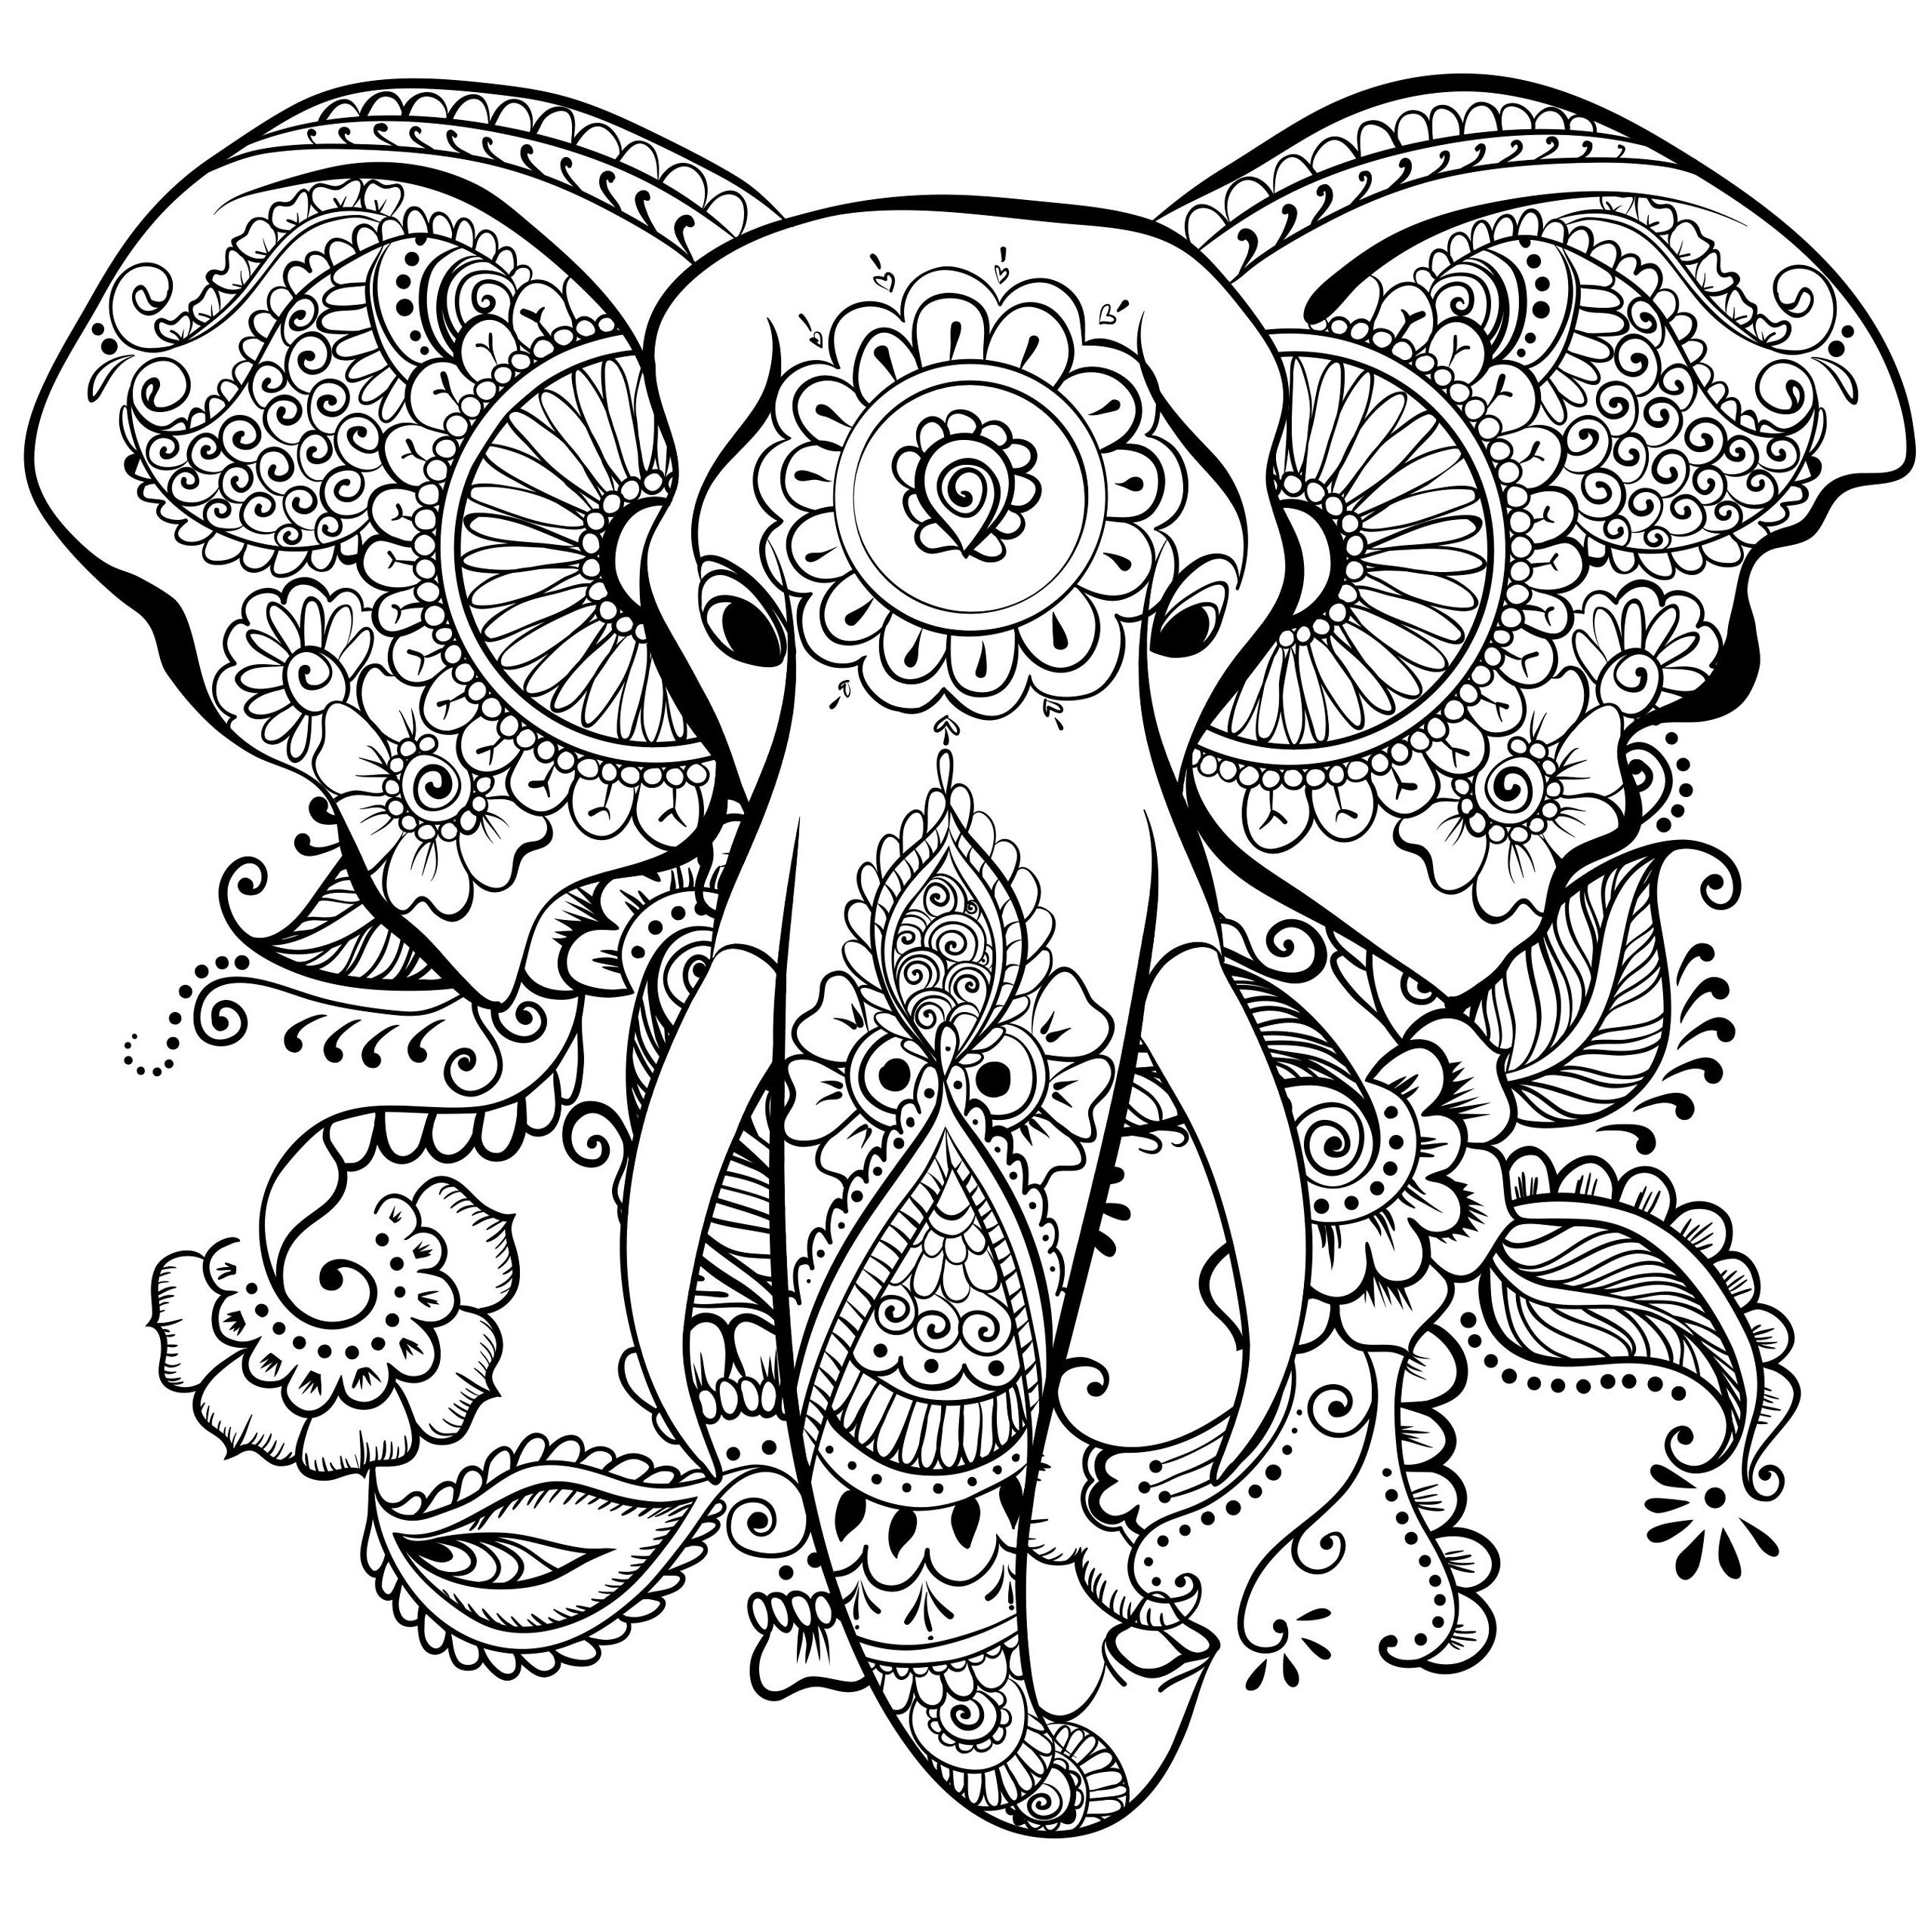 Take A Look At Mandalas En 2020 Coloriage Mandala Animaux Coloriage Mandala Coloriage Elephant